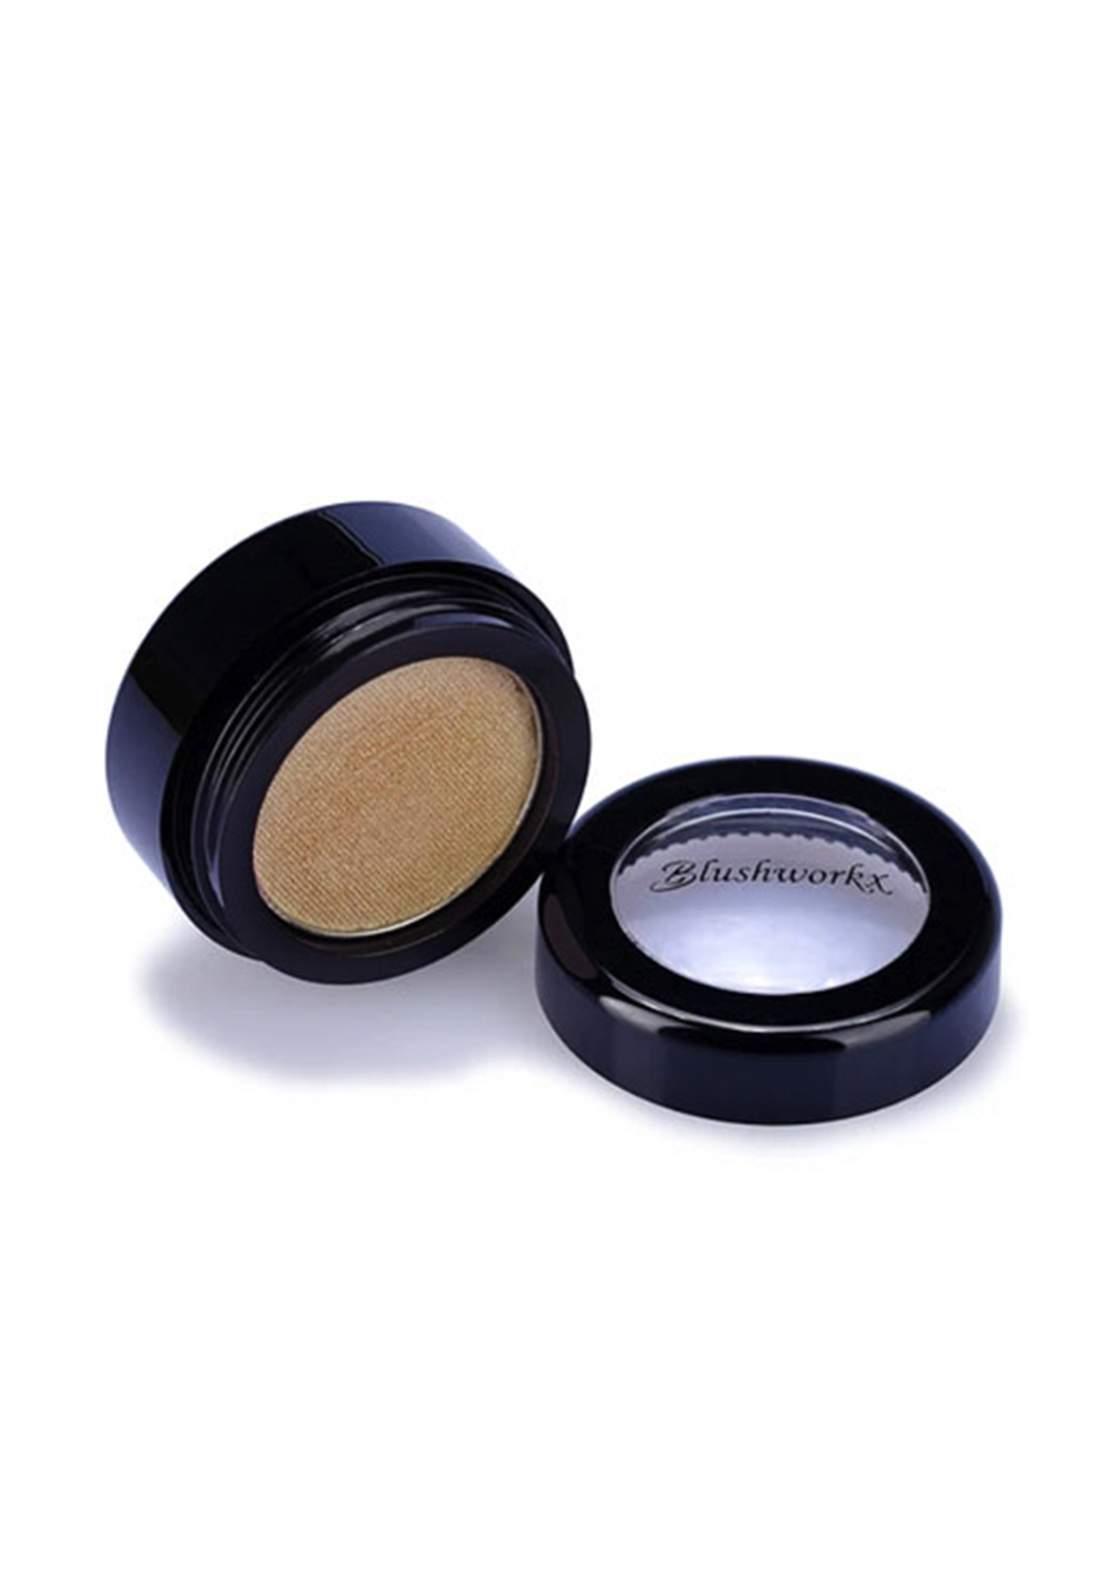 Blushworkx Hollywood Mineral Eye Color No.A1 Oyster 1.8g ظلال للعيون